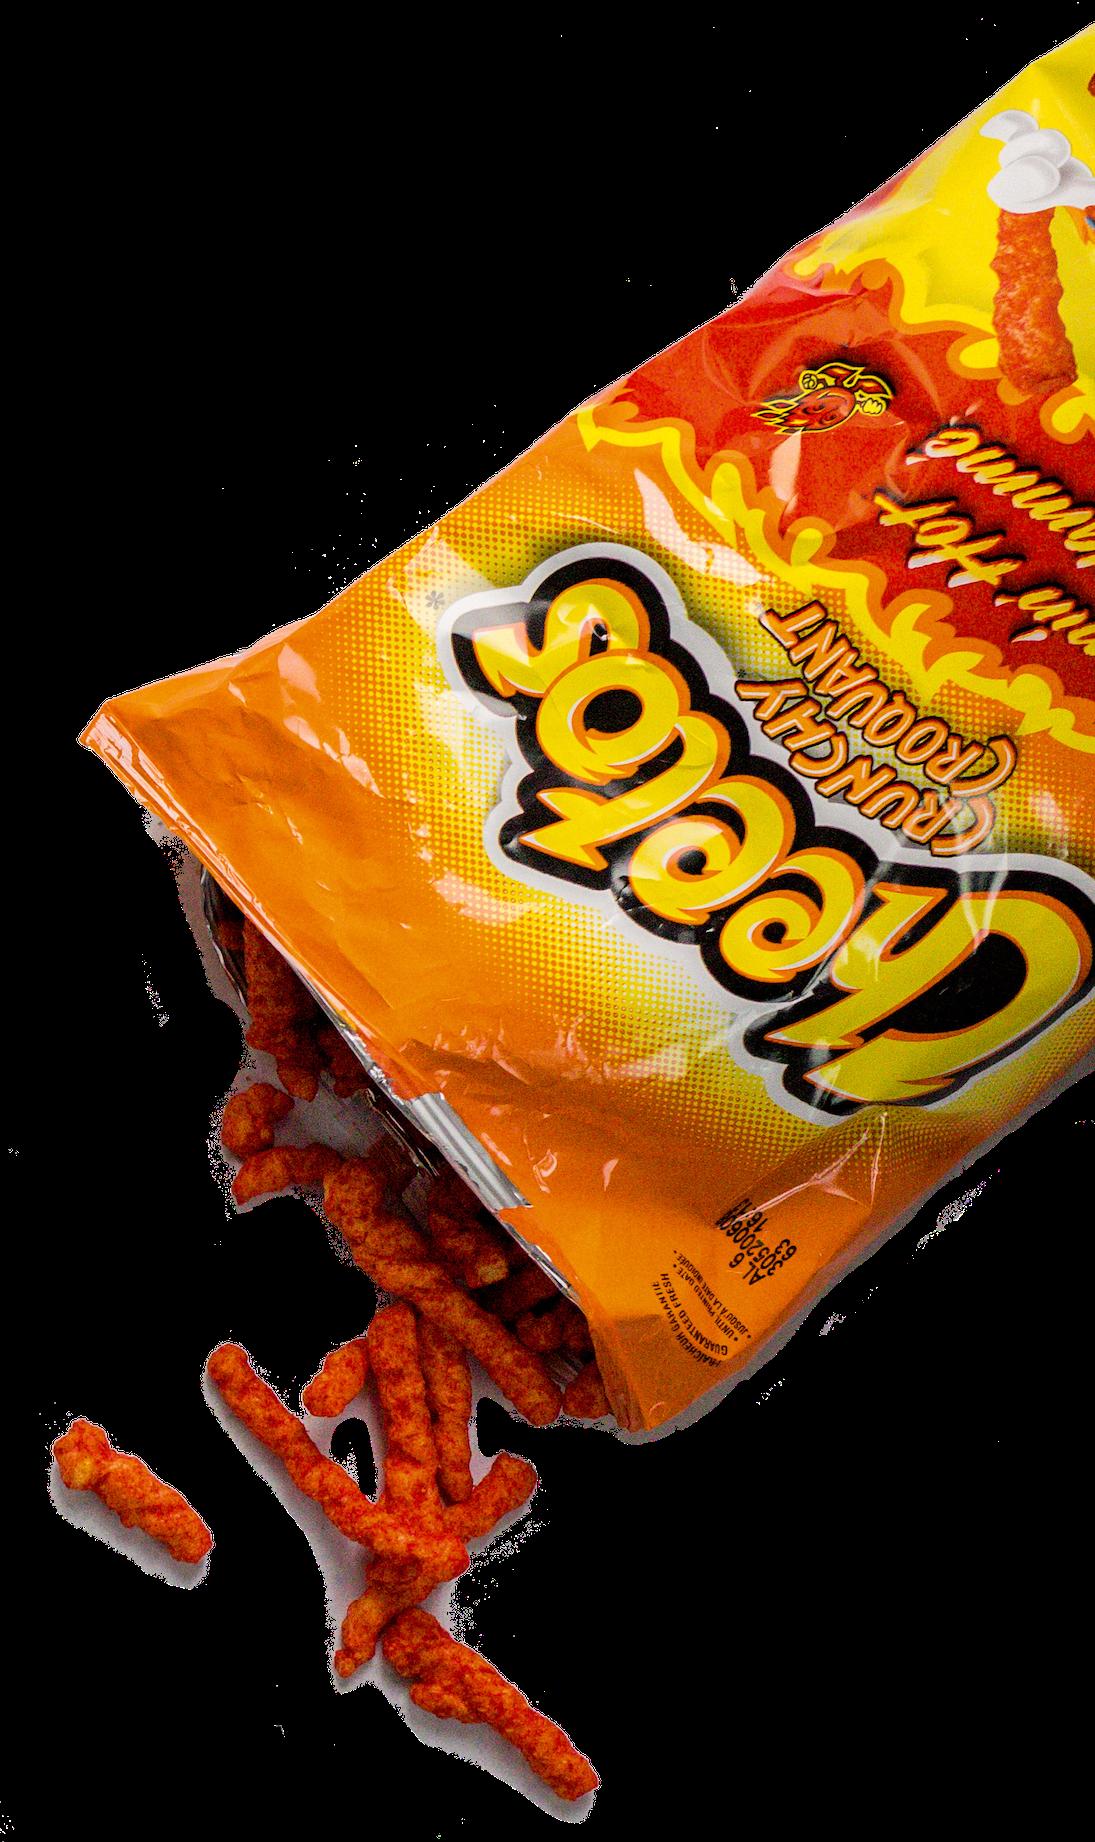 graphic of cheetos